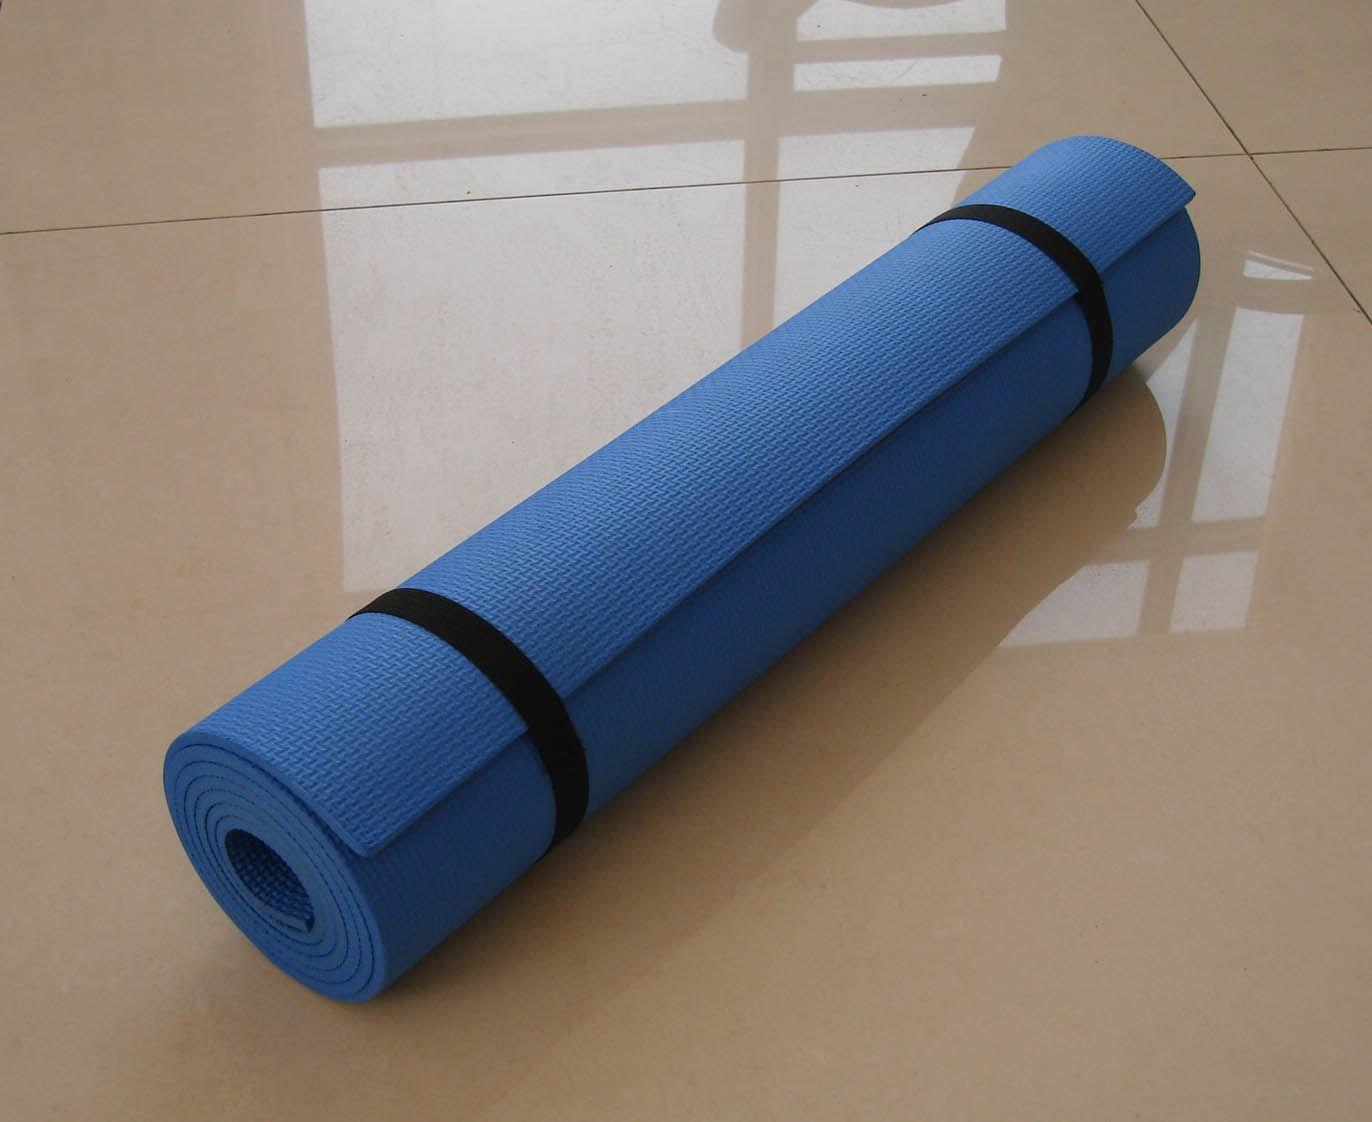 foam pcs mat eva ft floor mats gym interlocking flooring clevr itm sq exercise kids